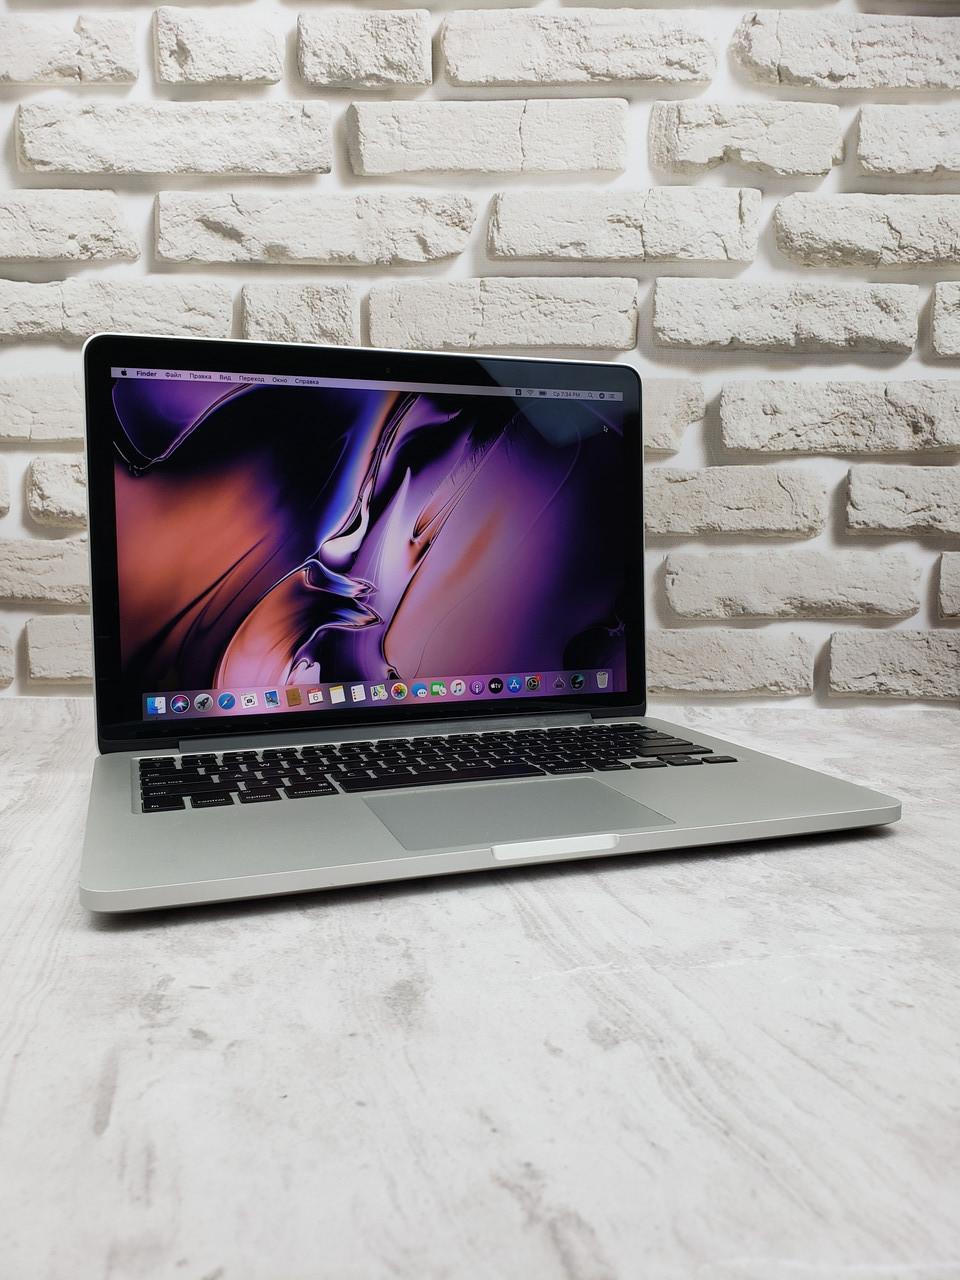 MacBook Pro Retina ME867 Late 2013 16Gb 256 SSD Магазин/Гарантия